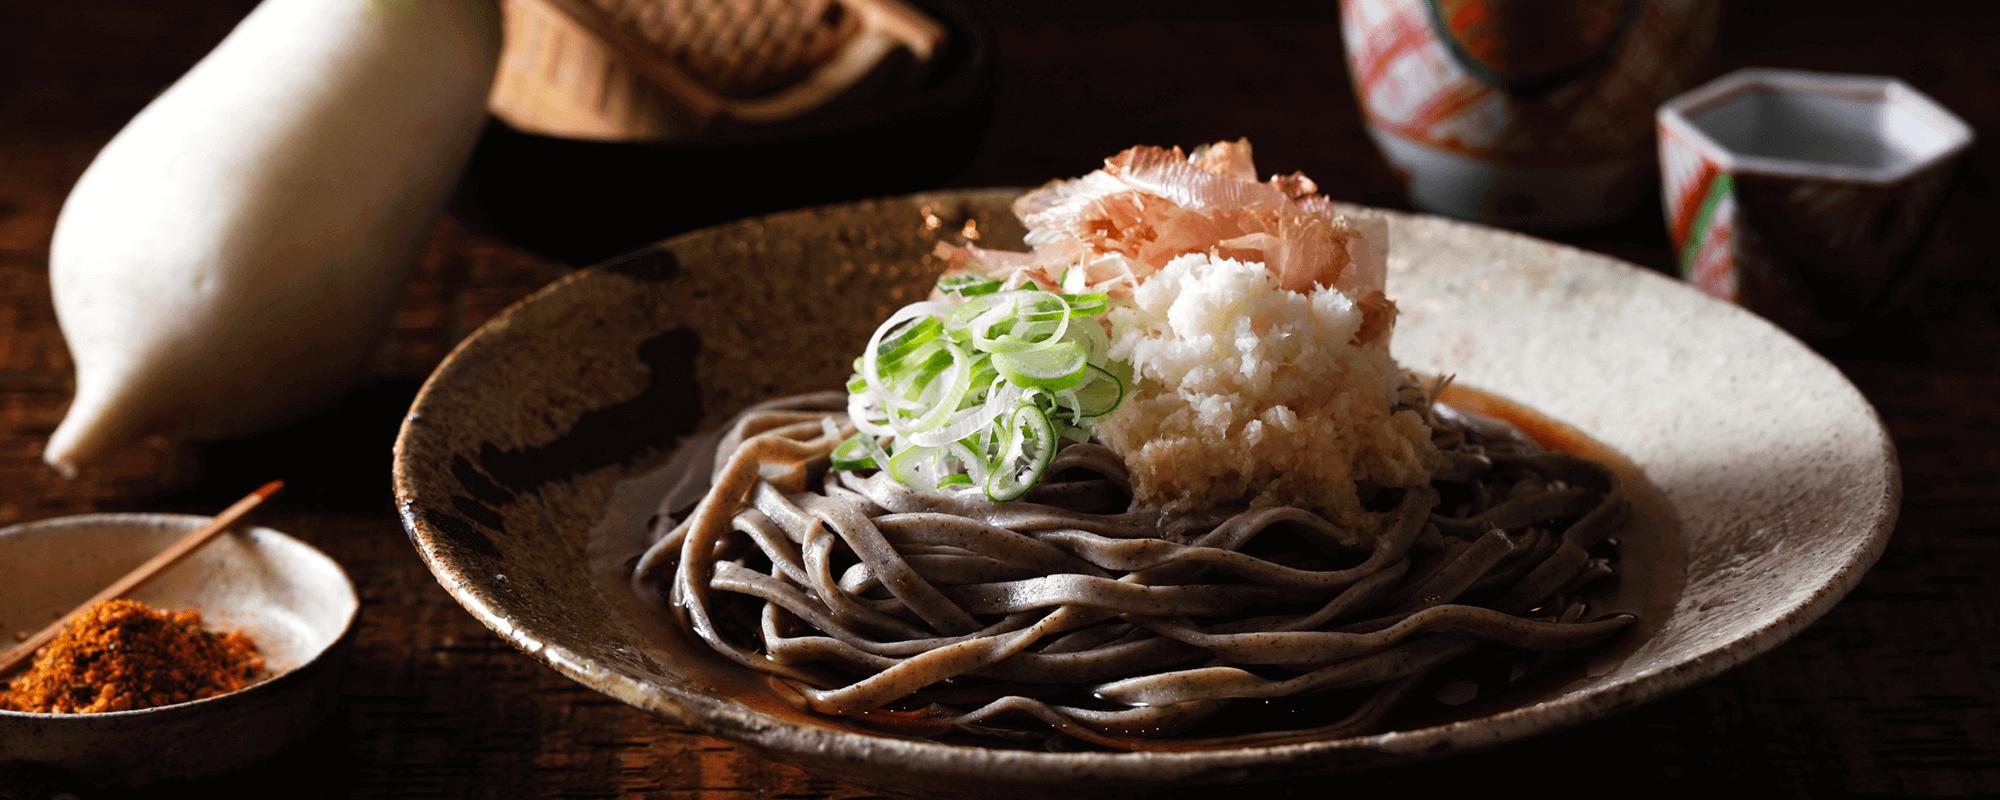 〈麺匠武生〉越前本流 八割そば (8番麺線)生麺3食・具材付き